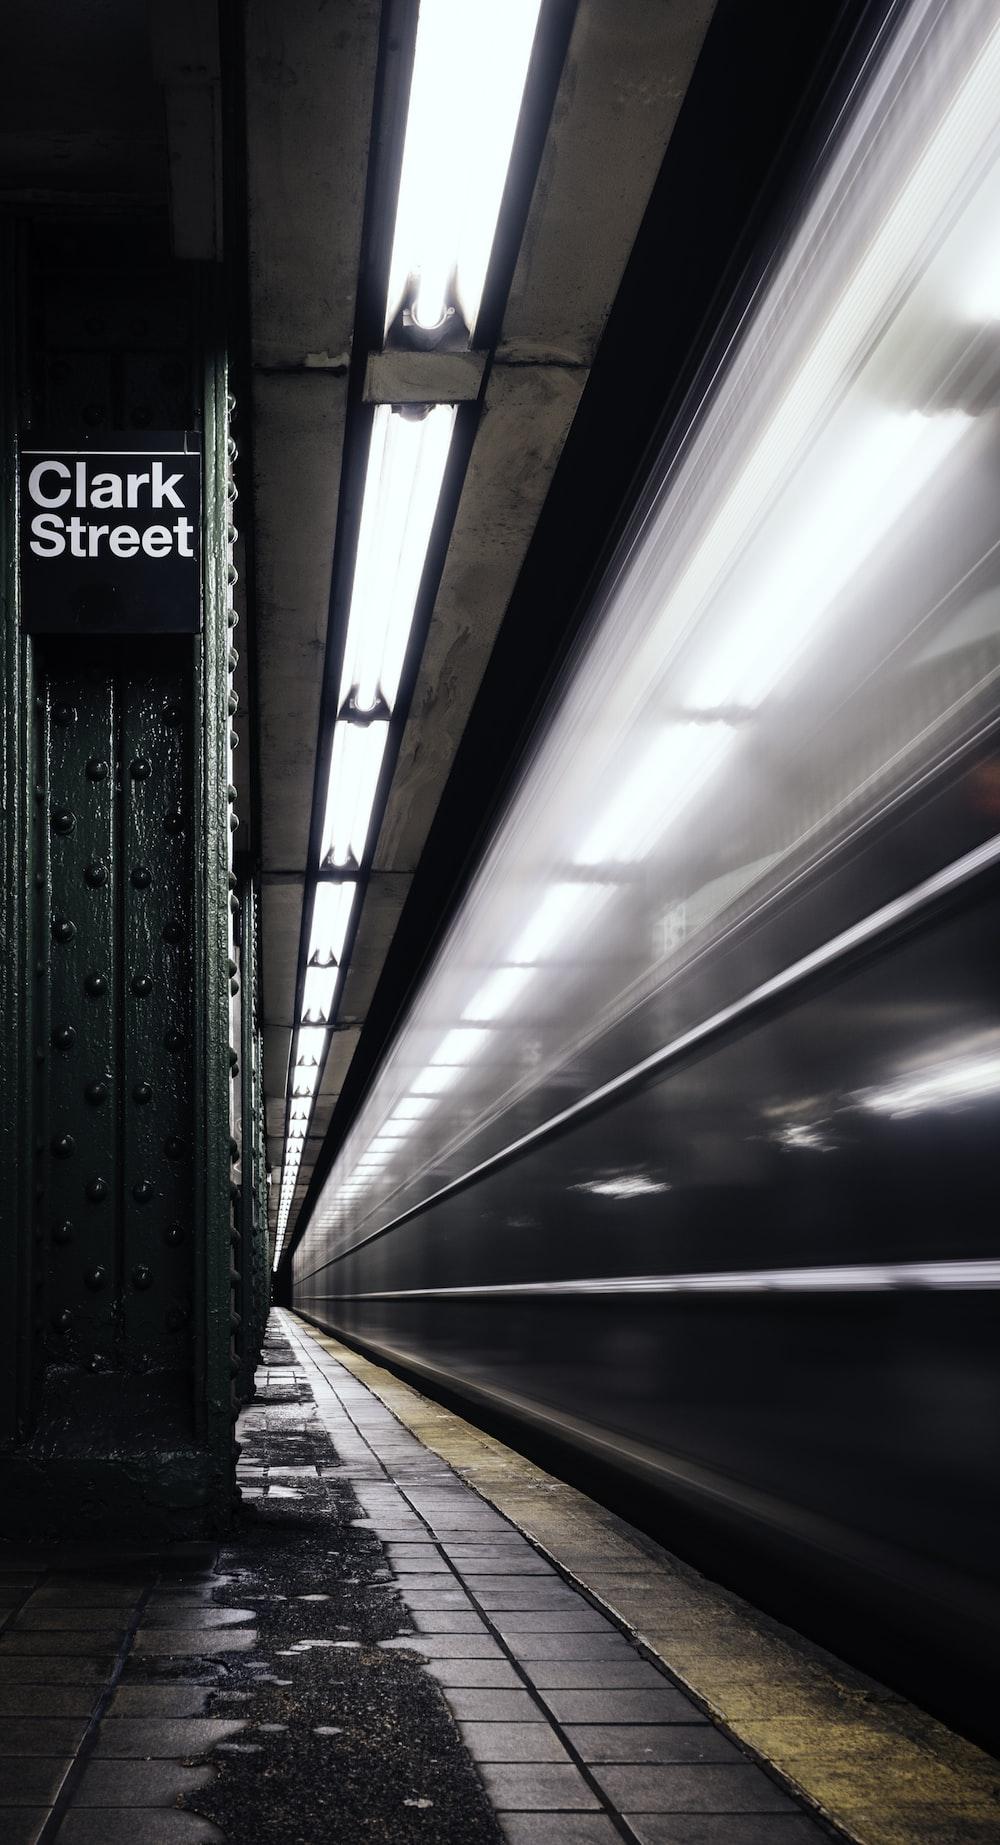 Clark Street signage during daytime